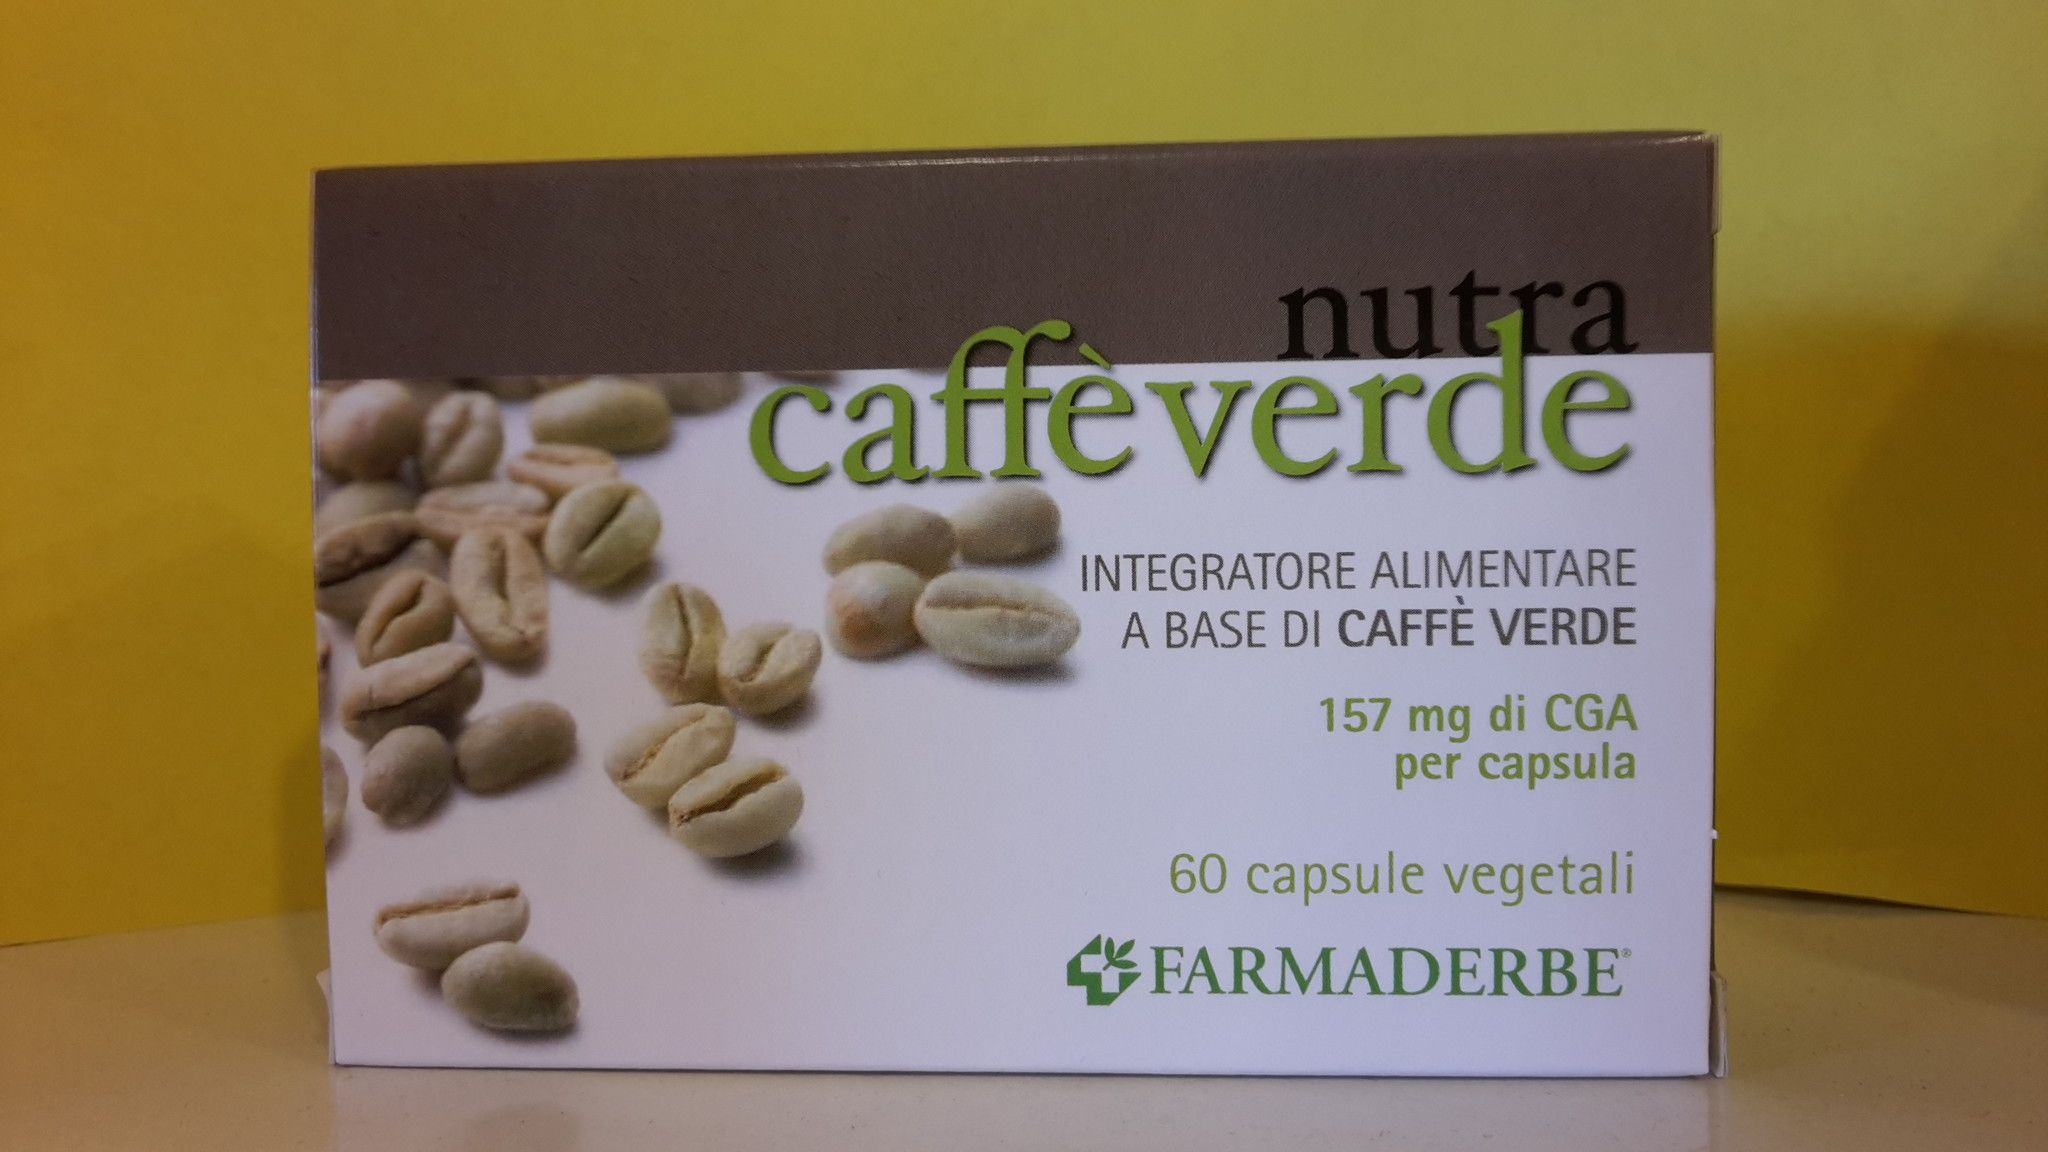 FARMADERBE  N. CAFFE' VERDE  60 cps